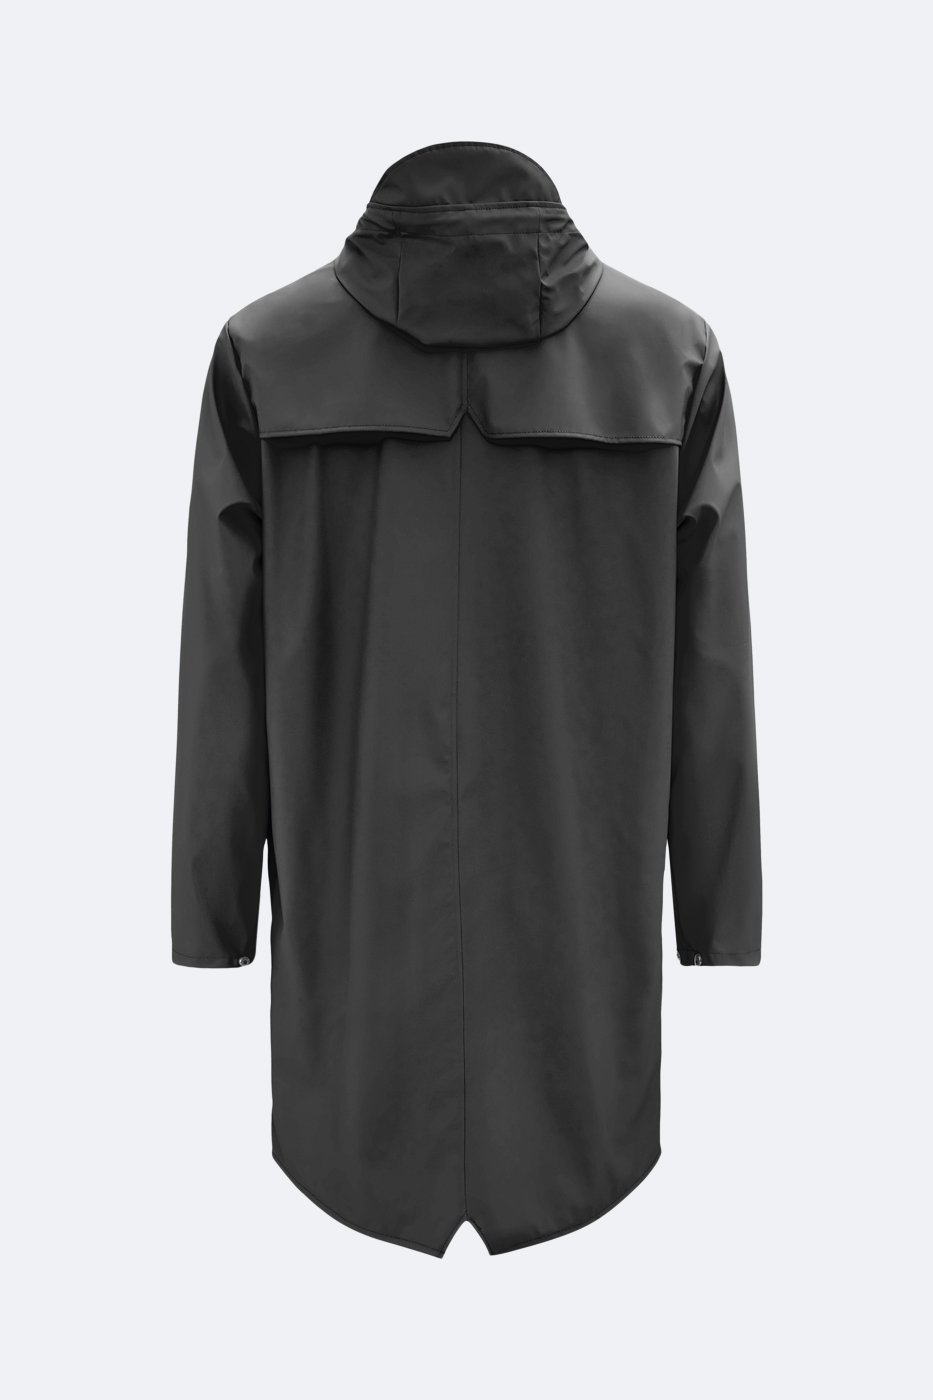 Rains Long Jacket schwarz unisex XS/S